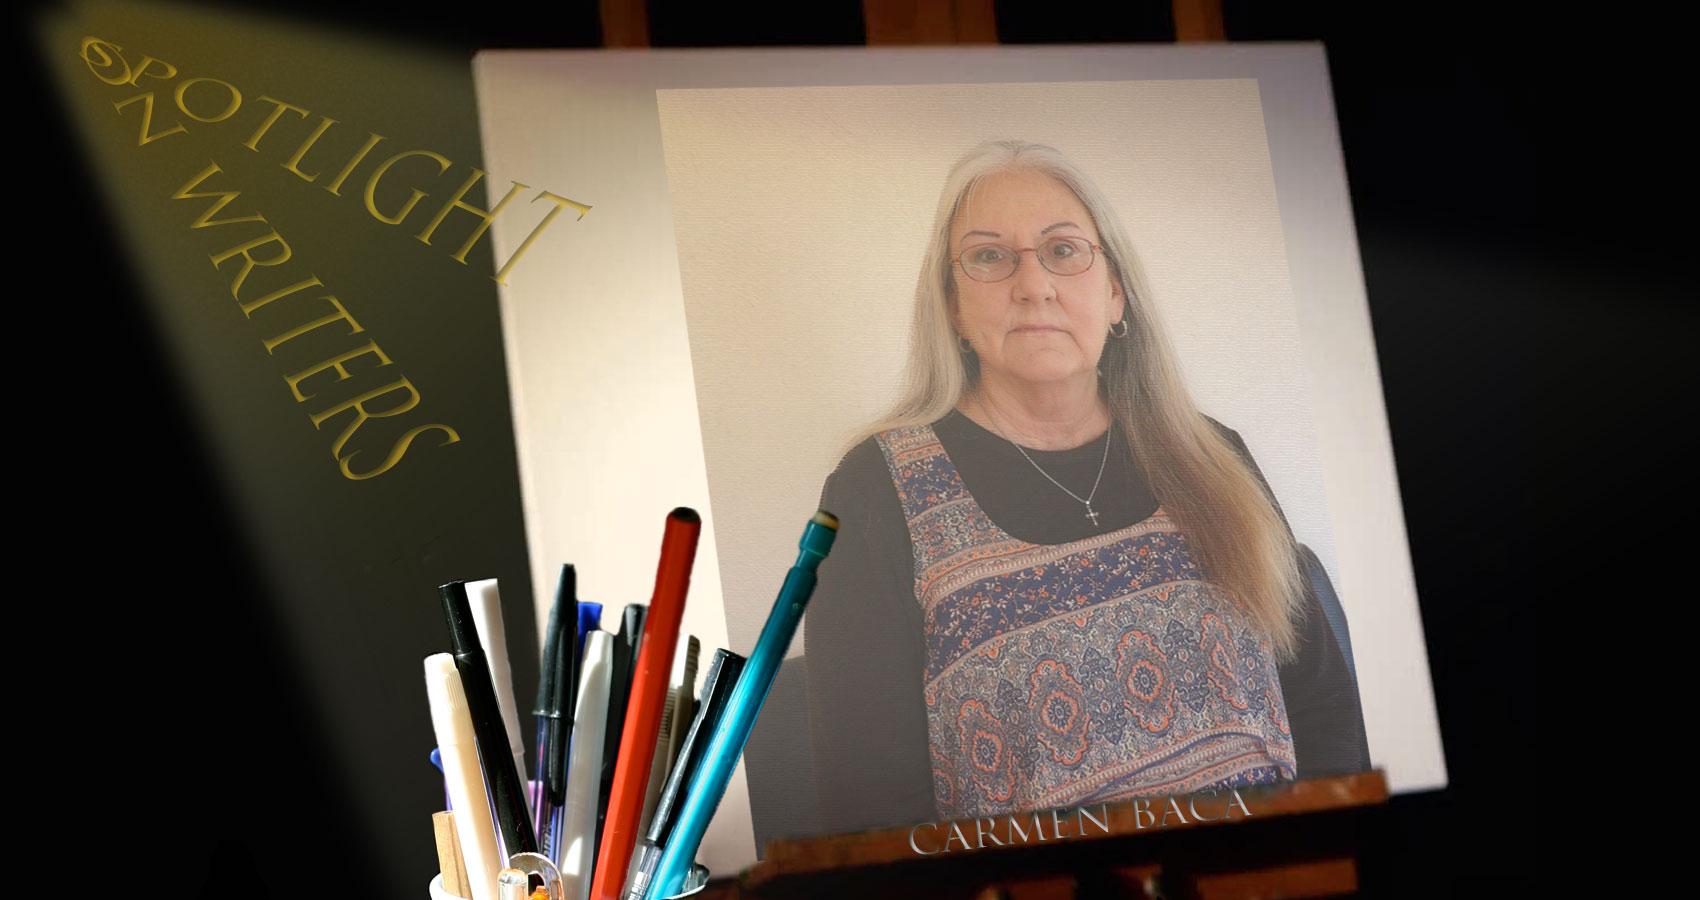 Spotlight On Writers - Carmen Baca, interview at Spillwords.com